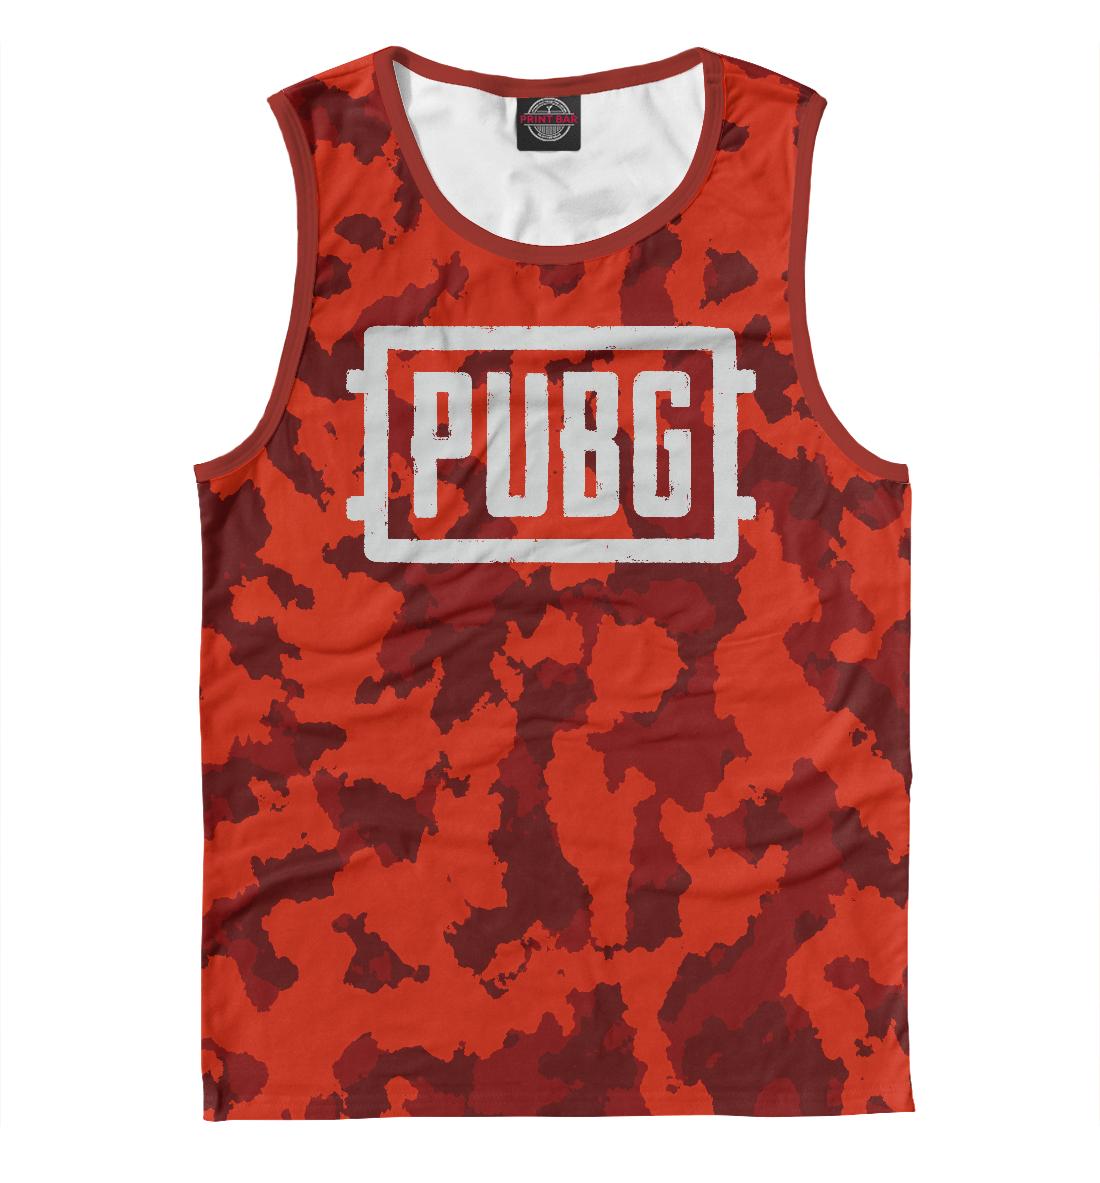 Купить PUBG Red Abstract, Printbar, Майки, PBG-299713-may-2